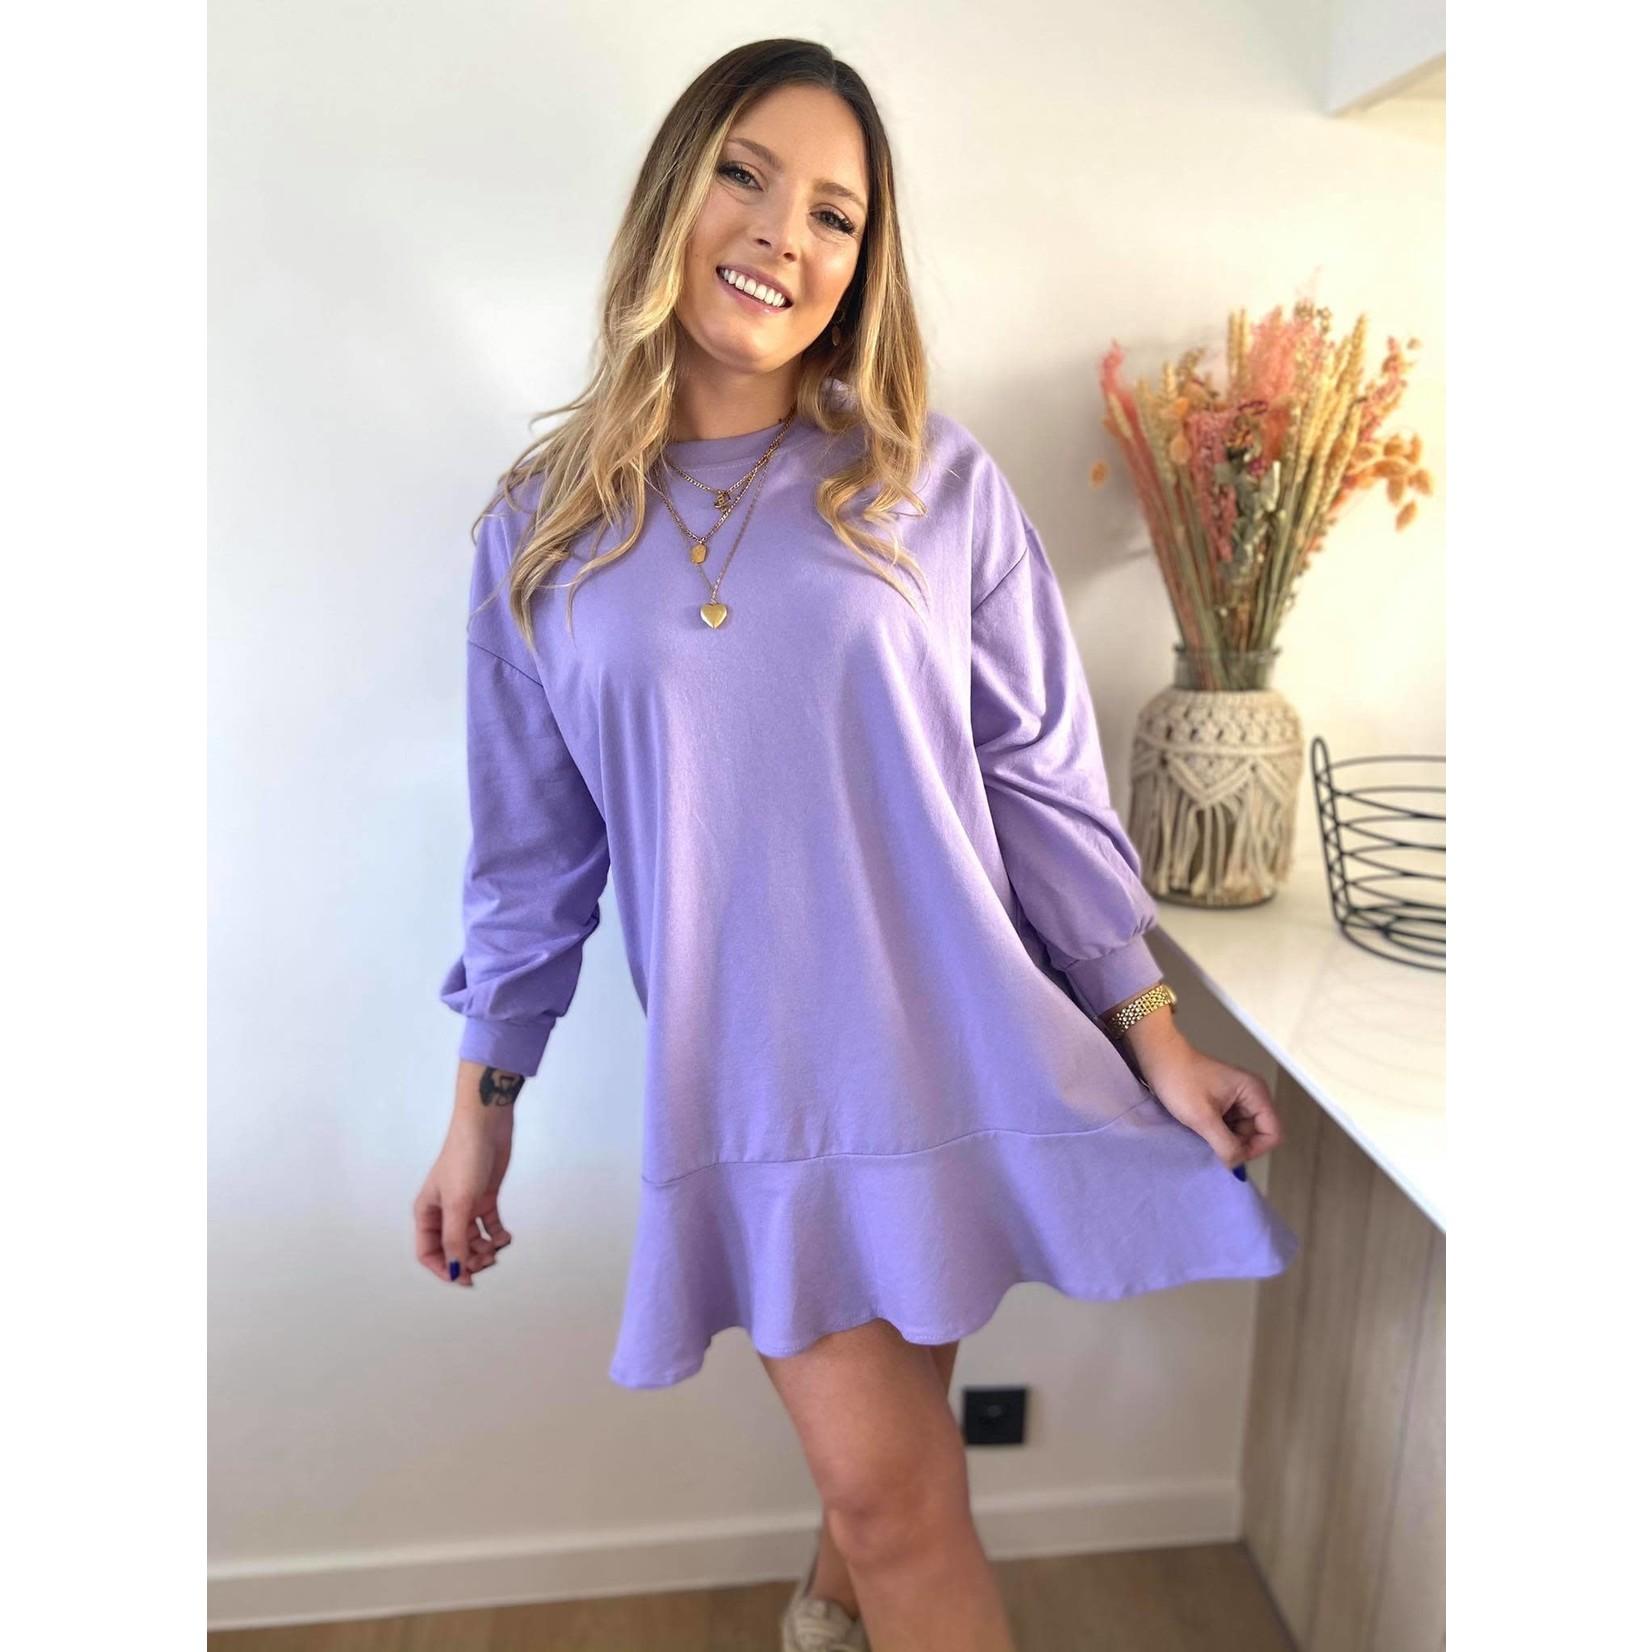 Sweatshirt dress with ruffles pink TU